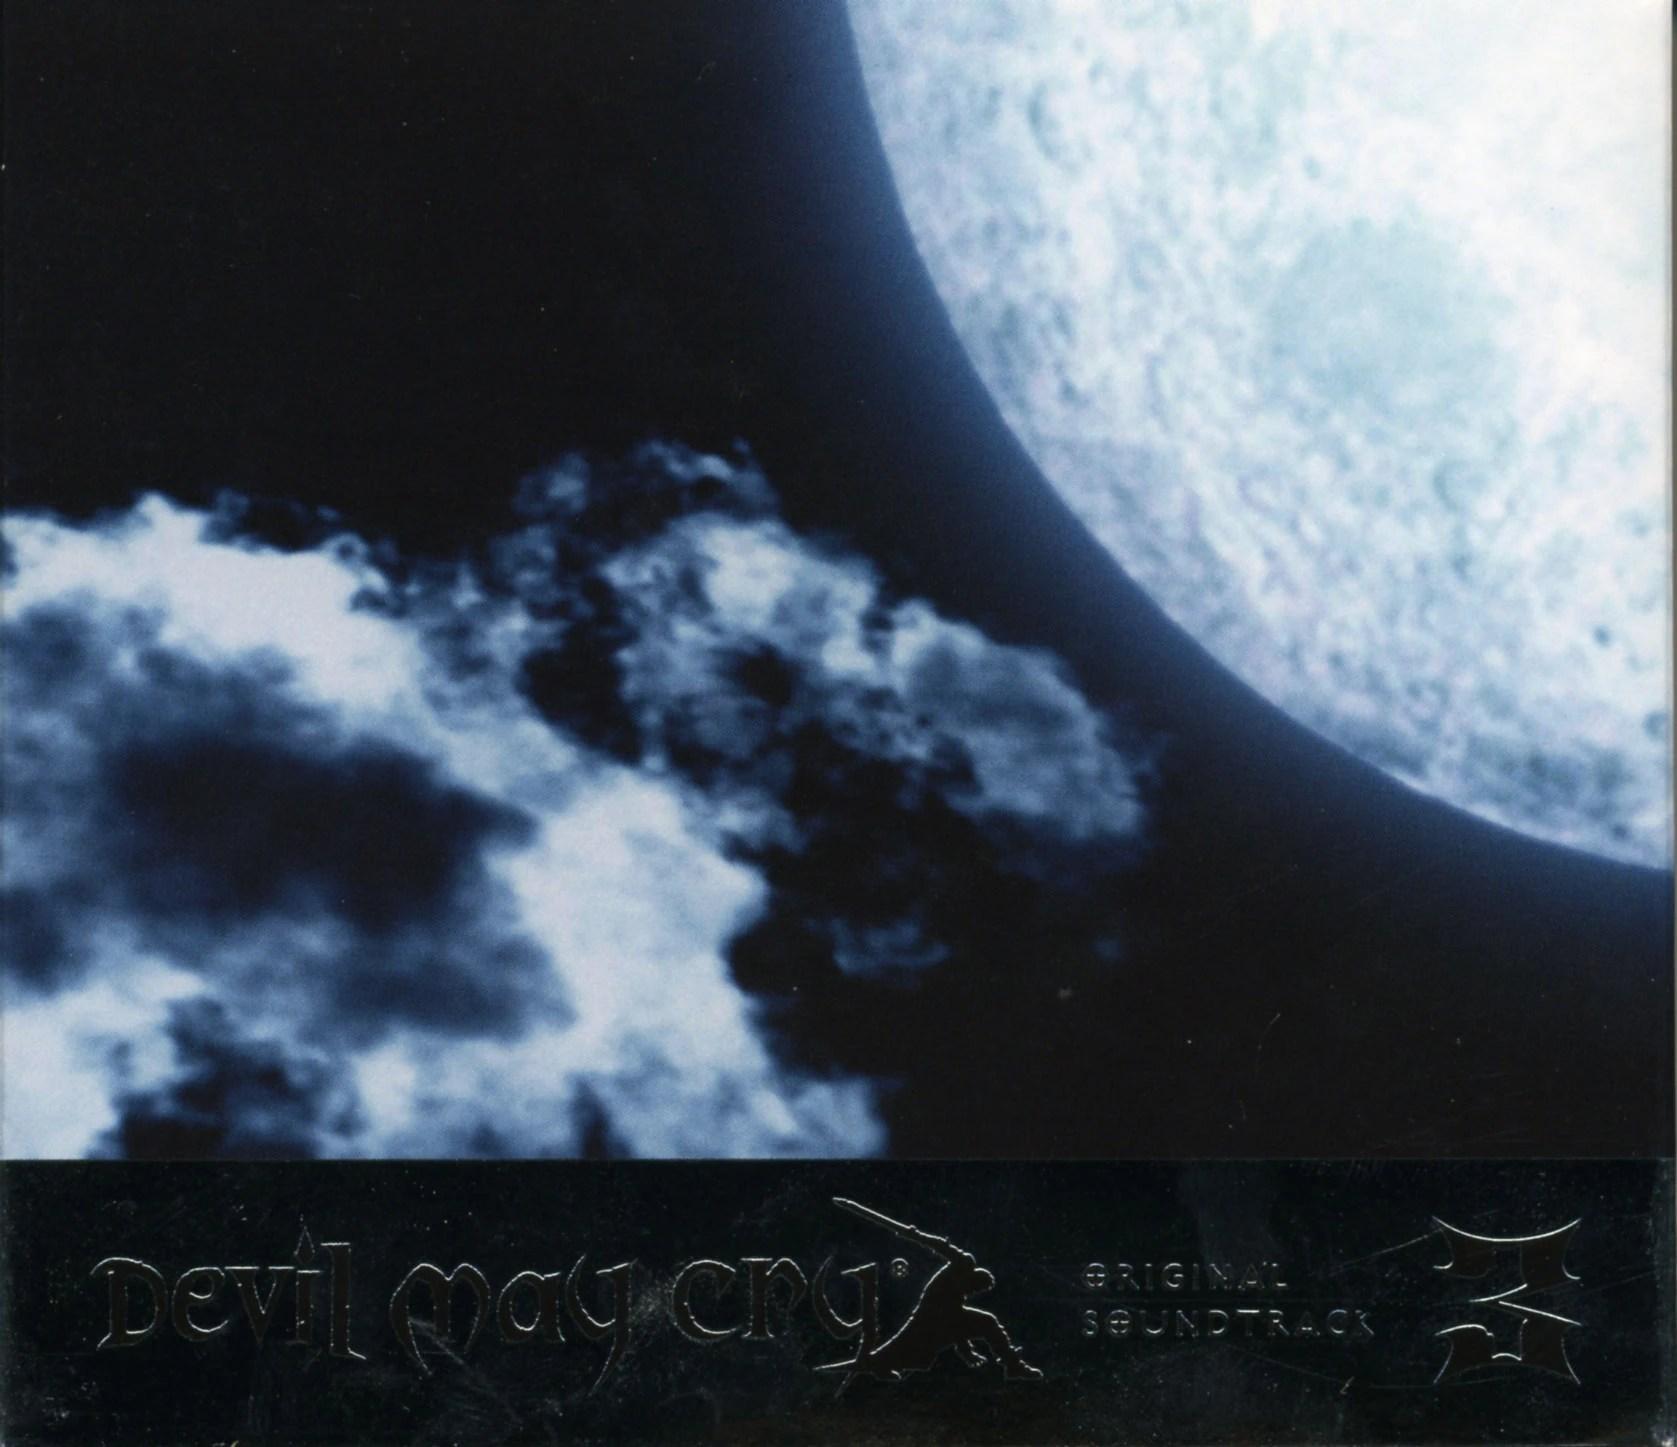 Devil May Cry 3 Original Soundtrack | Devil May Cry Wiki ...